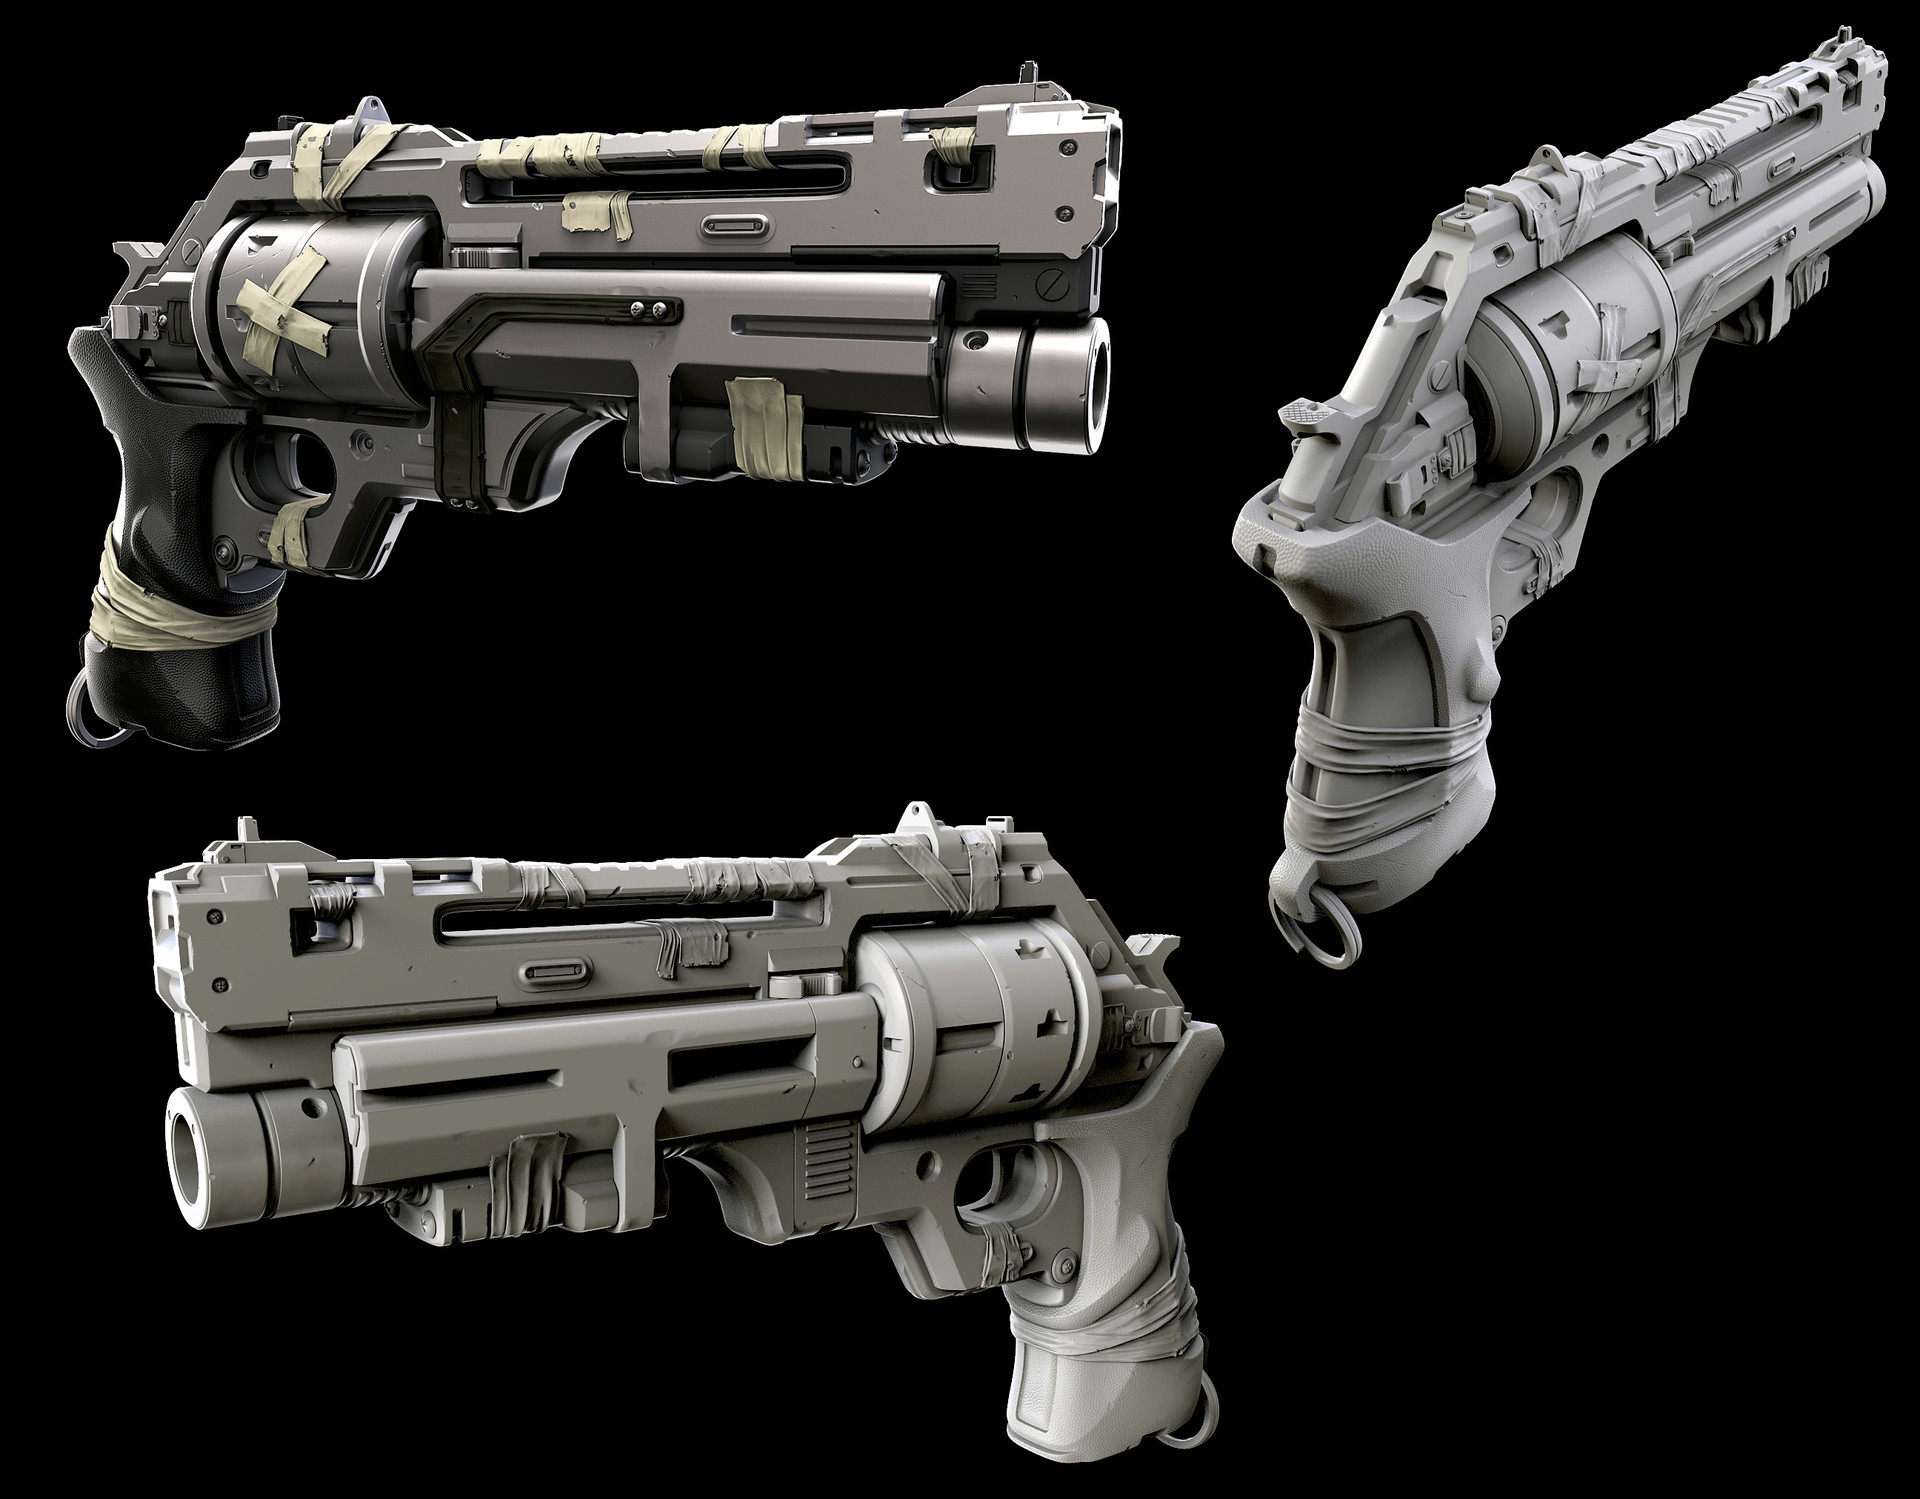 Kolby jukes drongo pistol